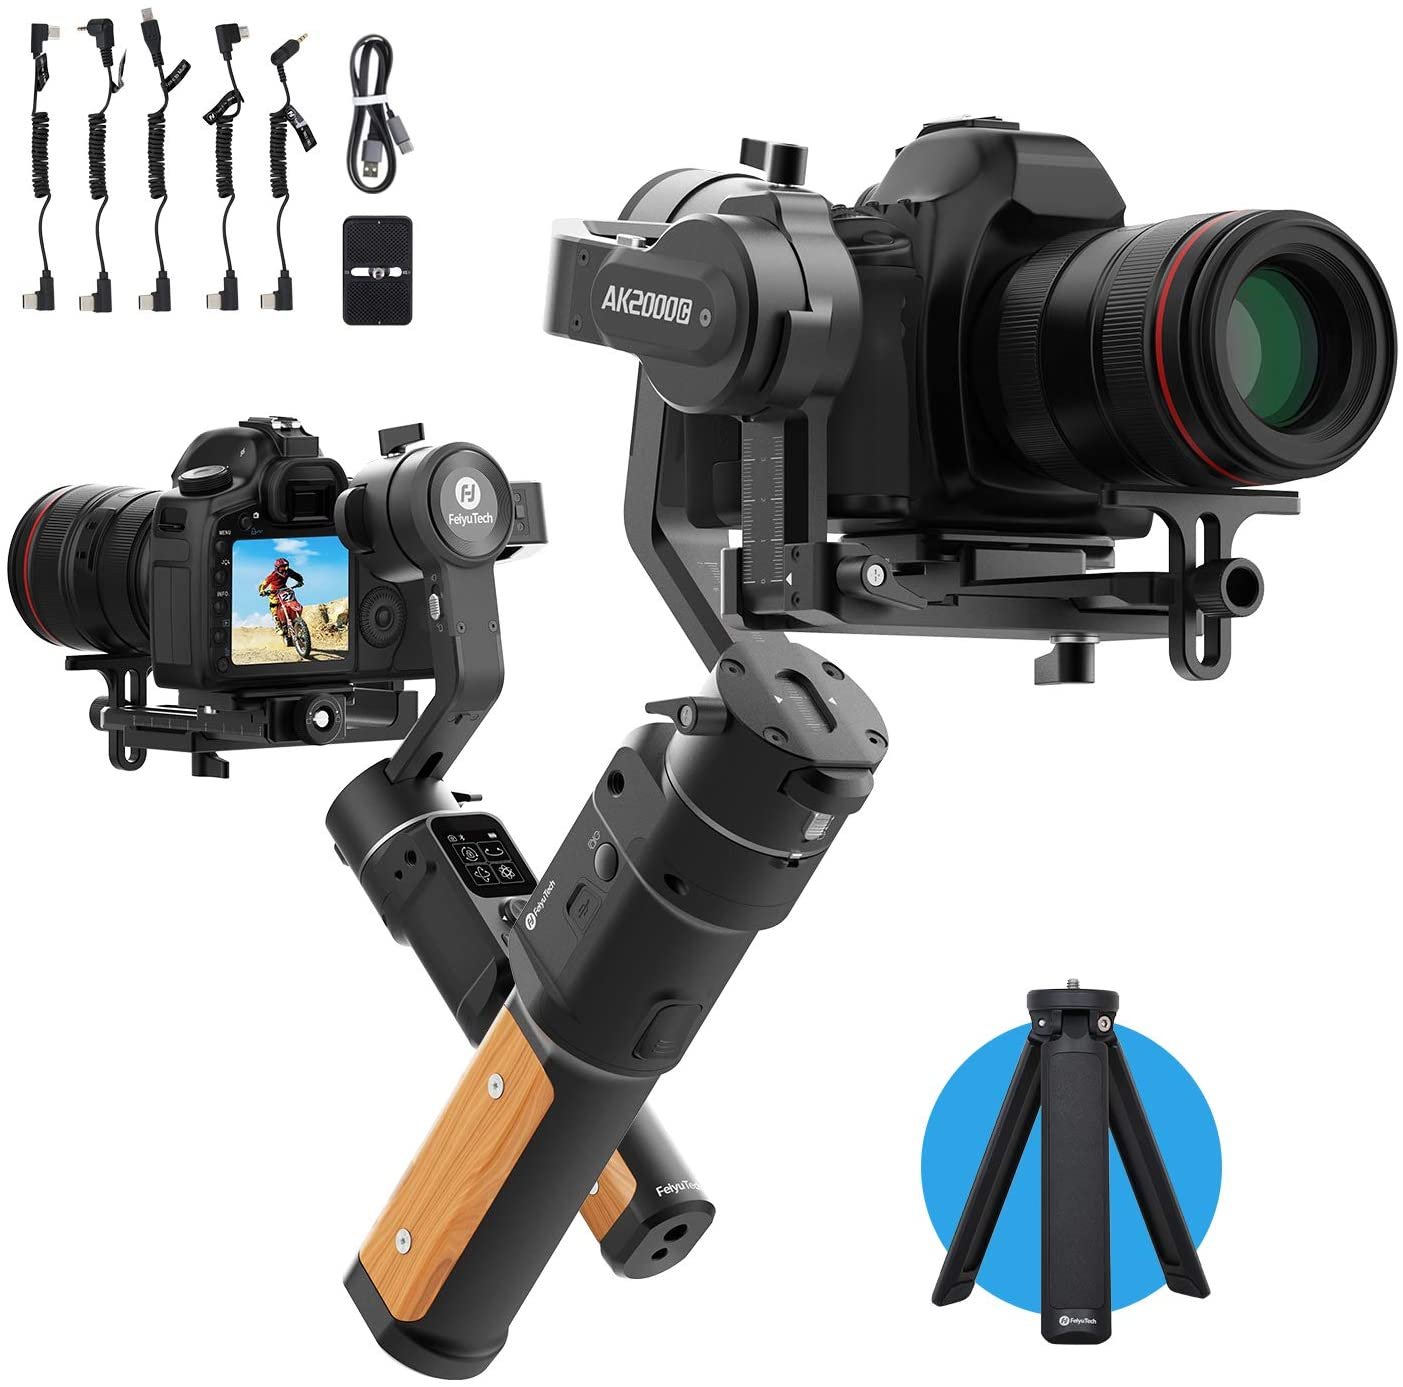 كاميرا FeiyuTech AK2000C مثبت انحراف مع شاشة لمس OLED متوافقة مع كاميرا DSLR Sony A9/A7series a6300 كانون M50